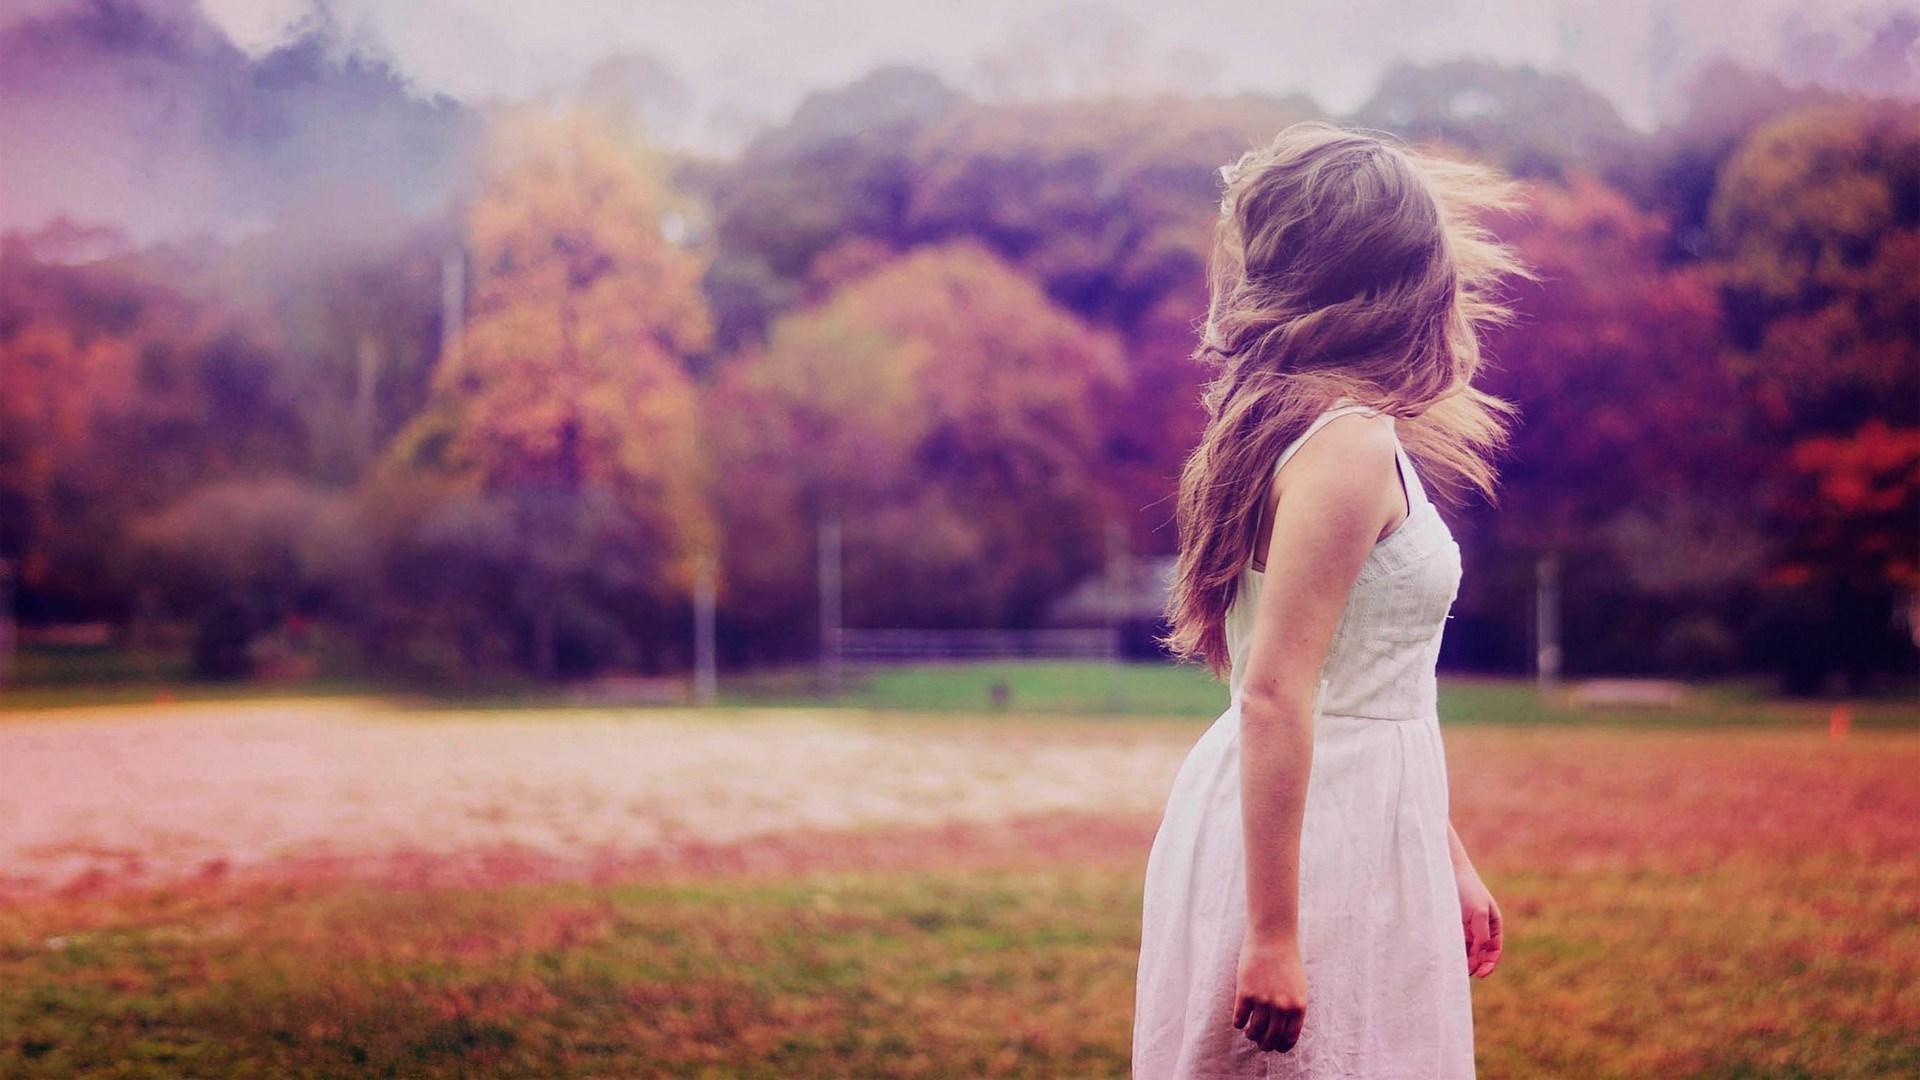 Girl Dress Nature Autumn Photo